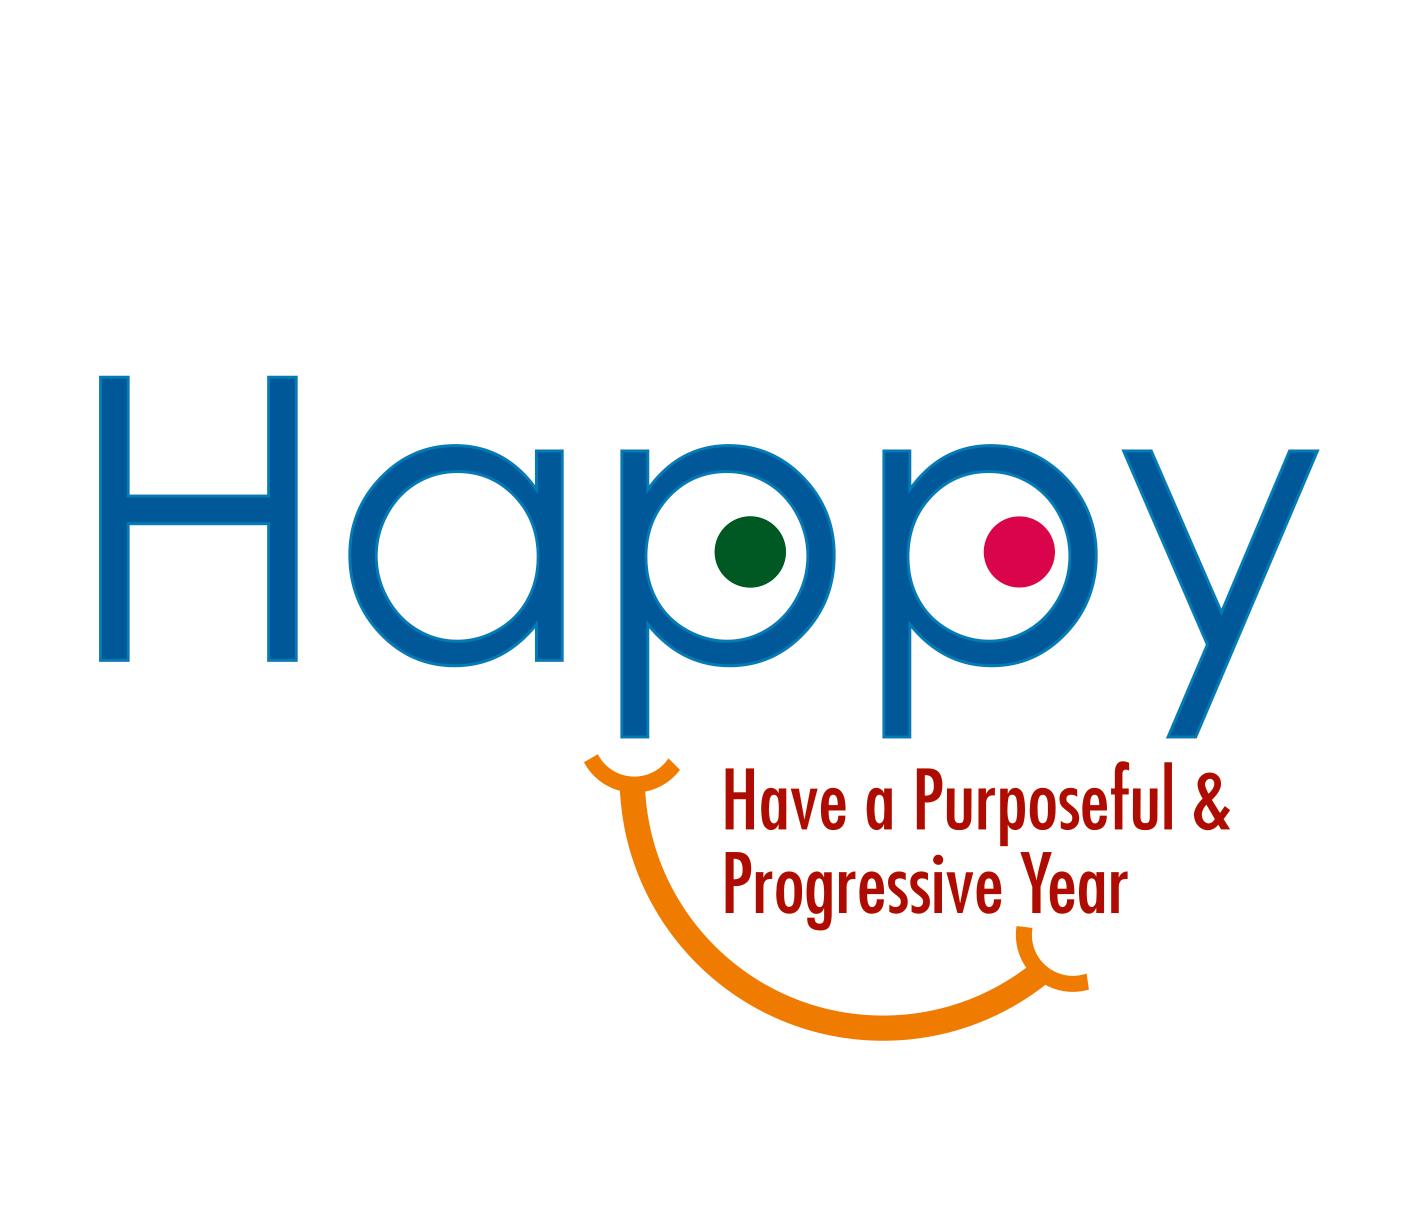 Download Rotary Logos, Themes, Photos.